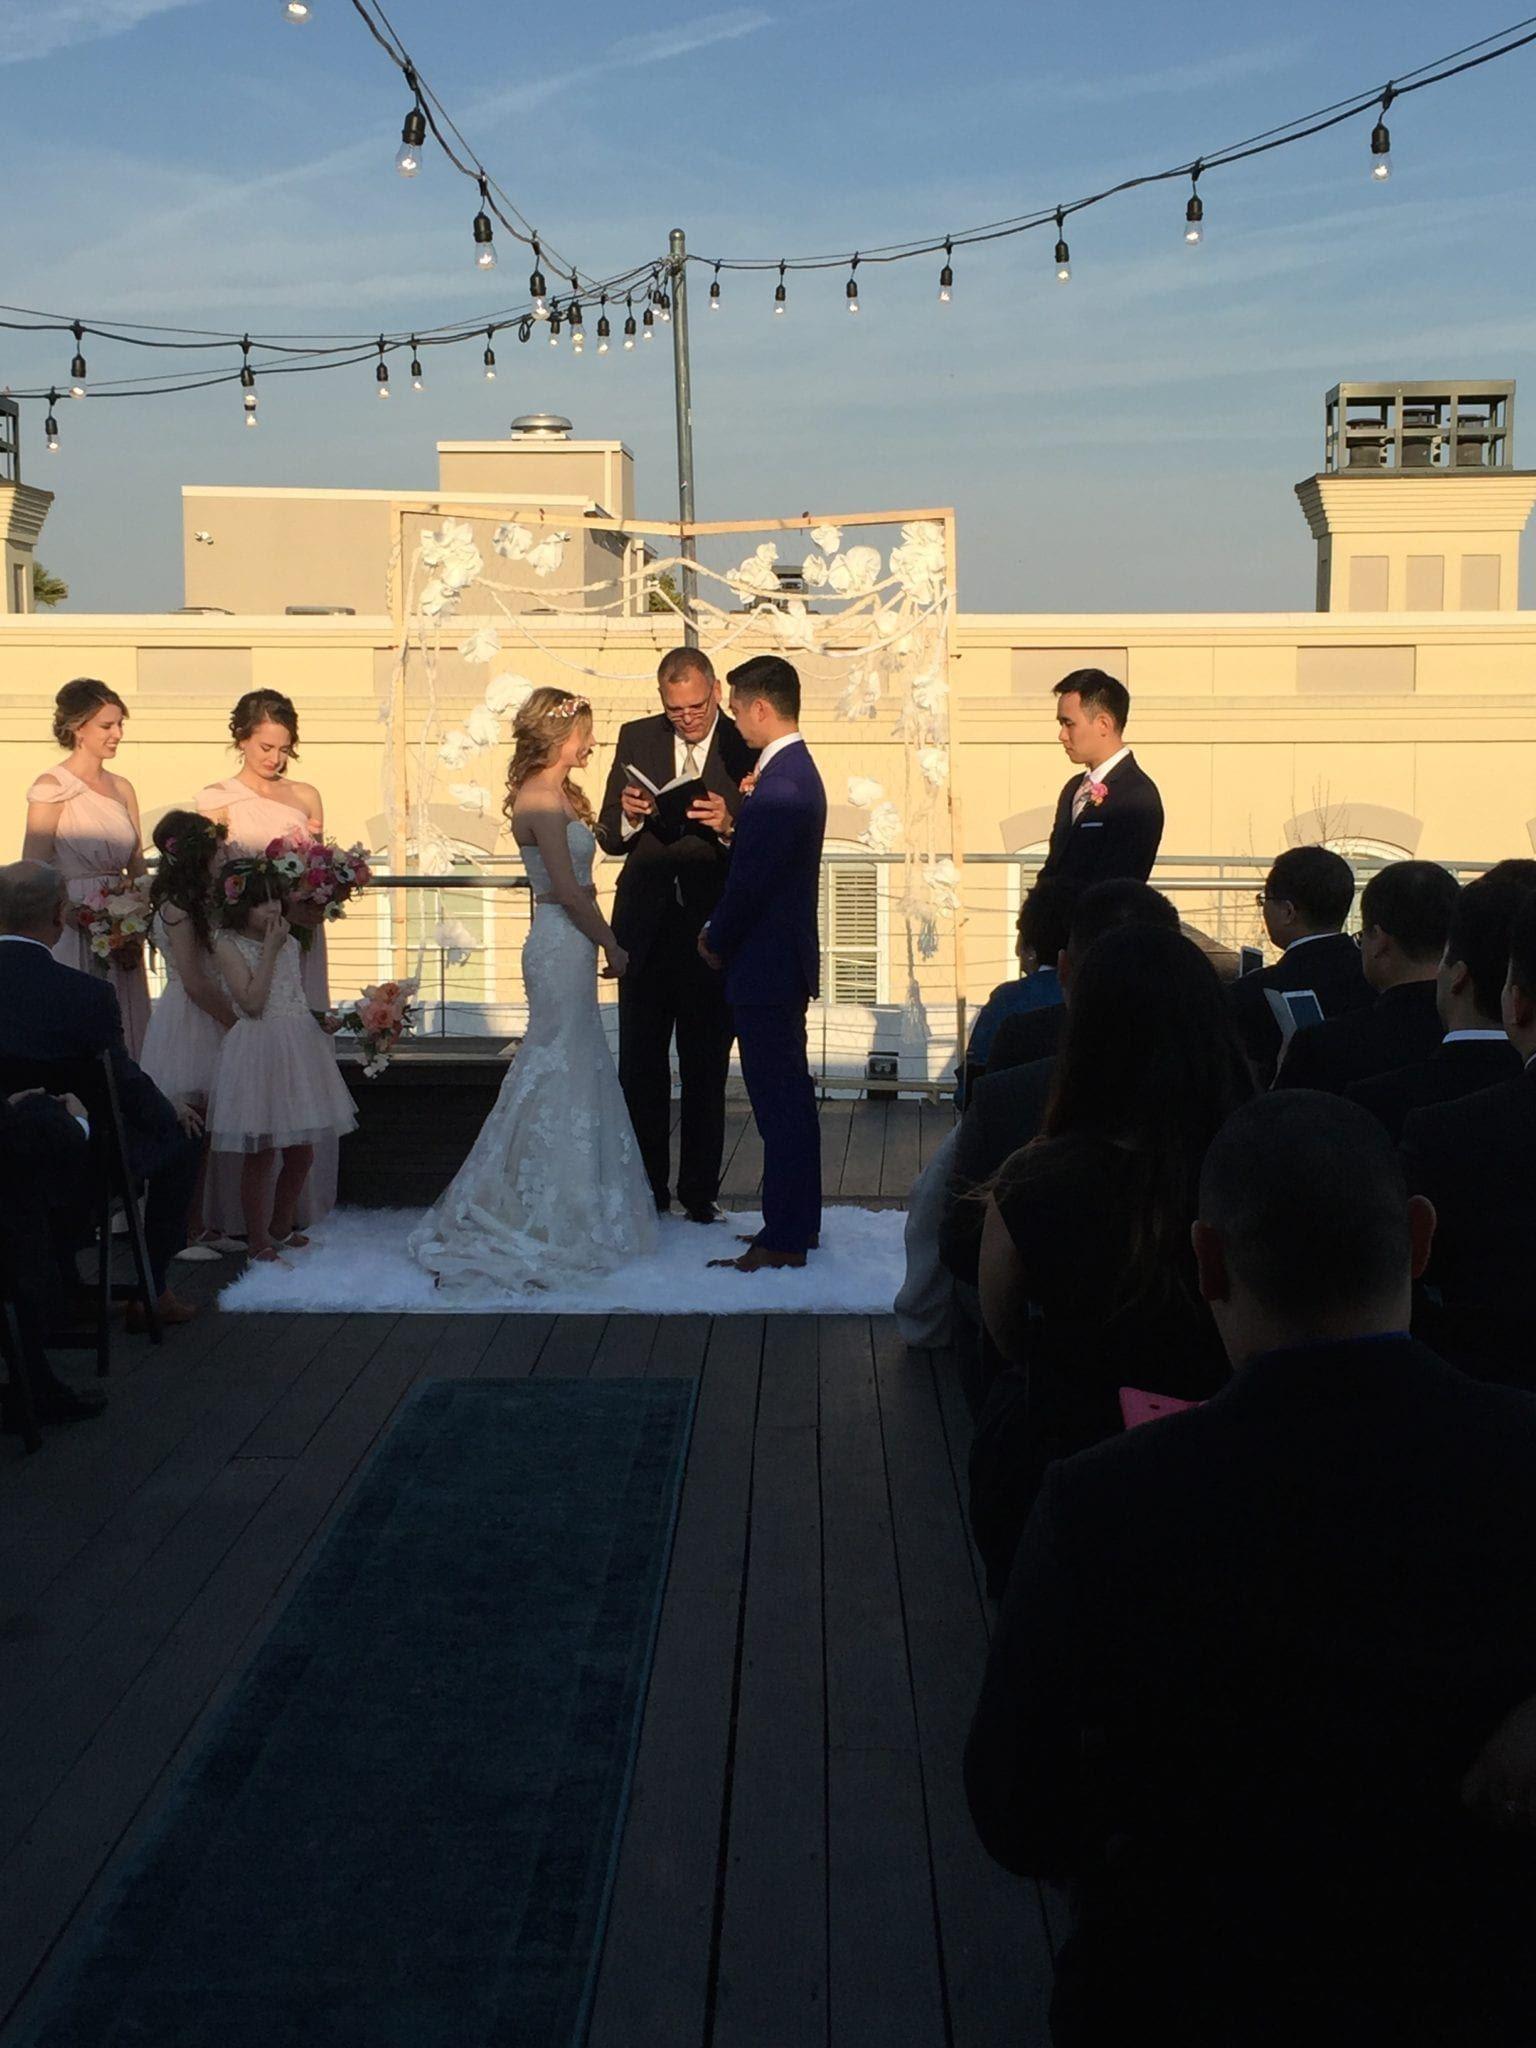 bunn dj company wedding at the vendue, charleston dj